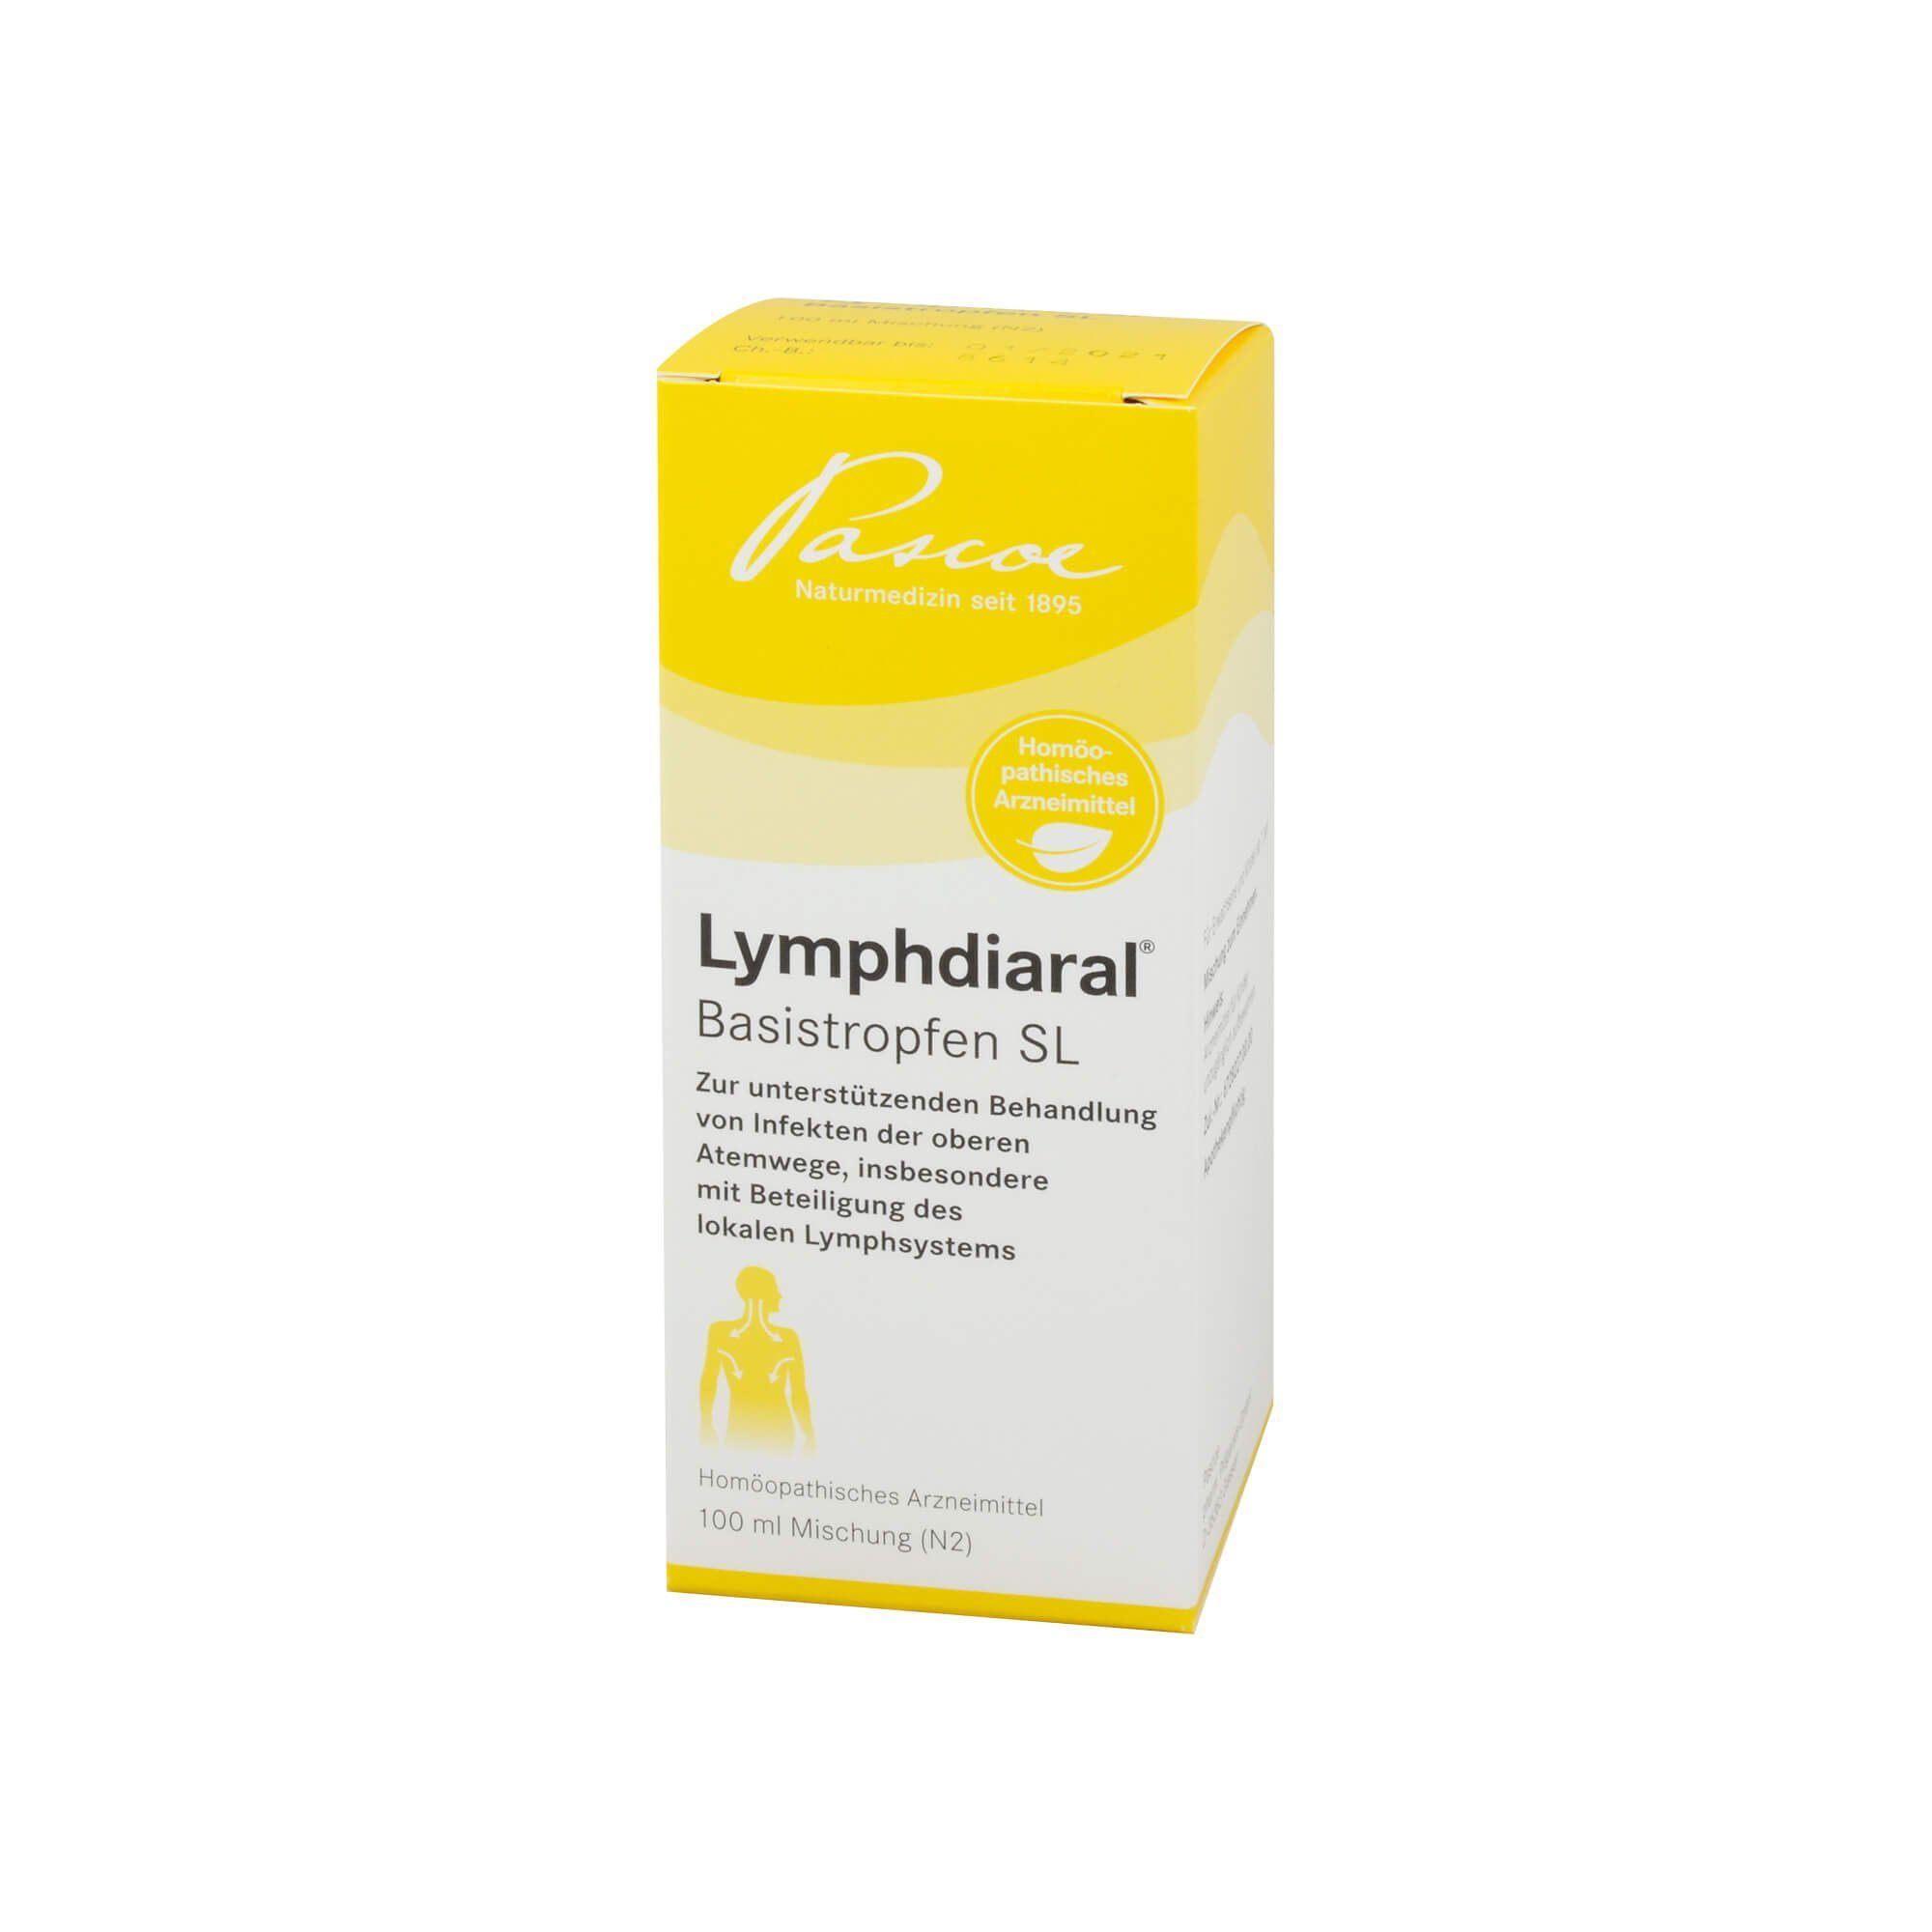 LYMPHDIARAL BASISTROPFEN SL , 100 ml